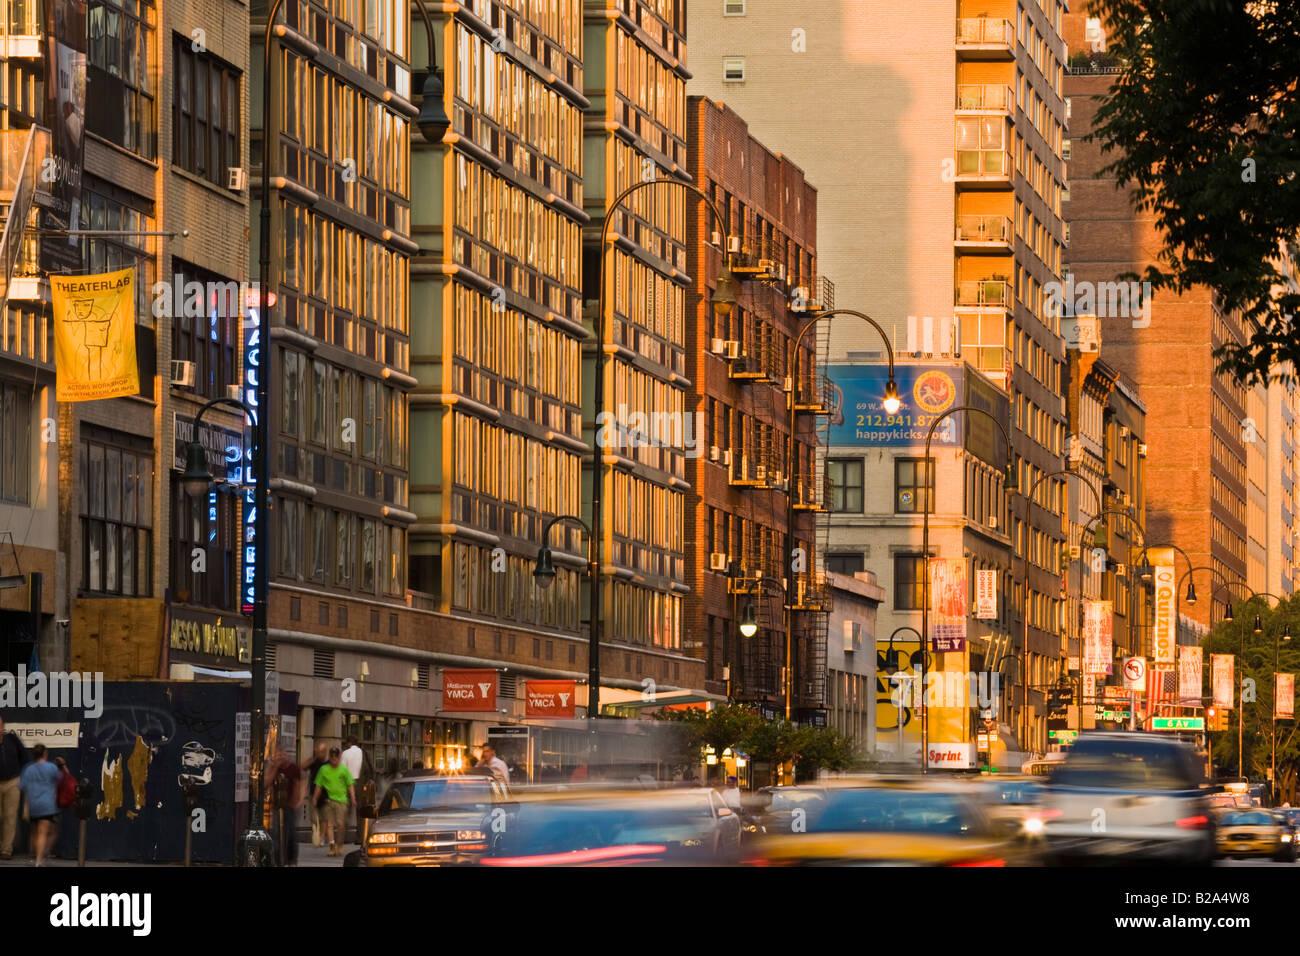 Fourteenth Street near Sixth Avenue New York City - Stock Image